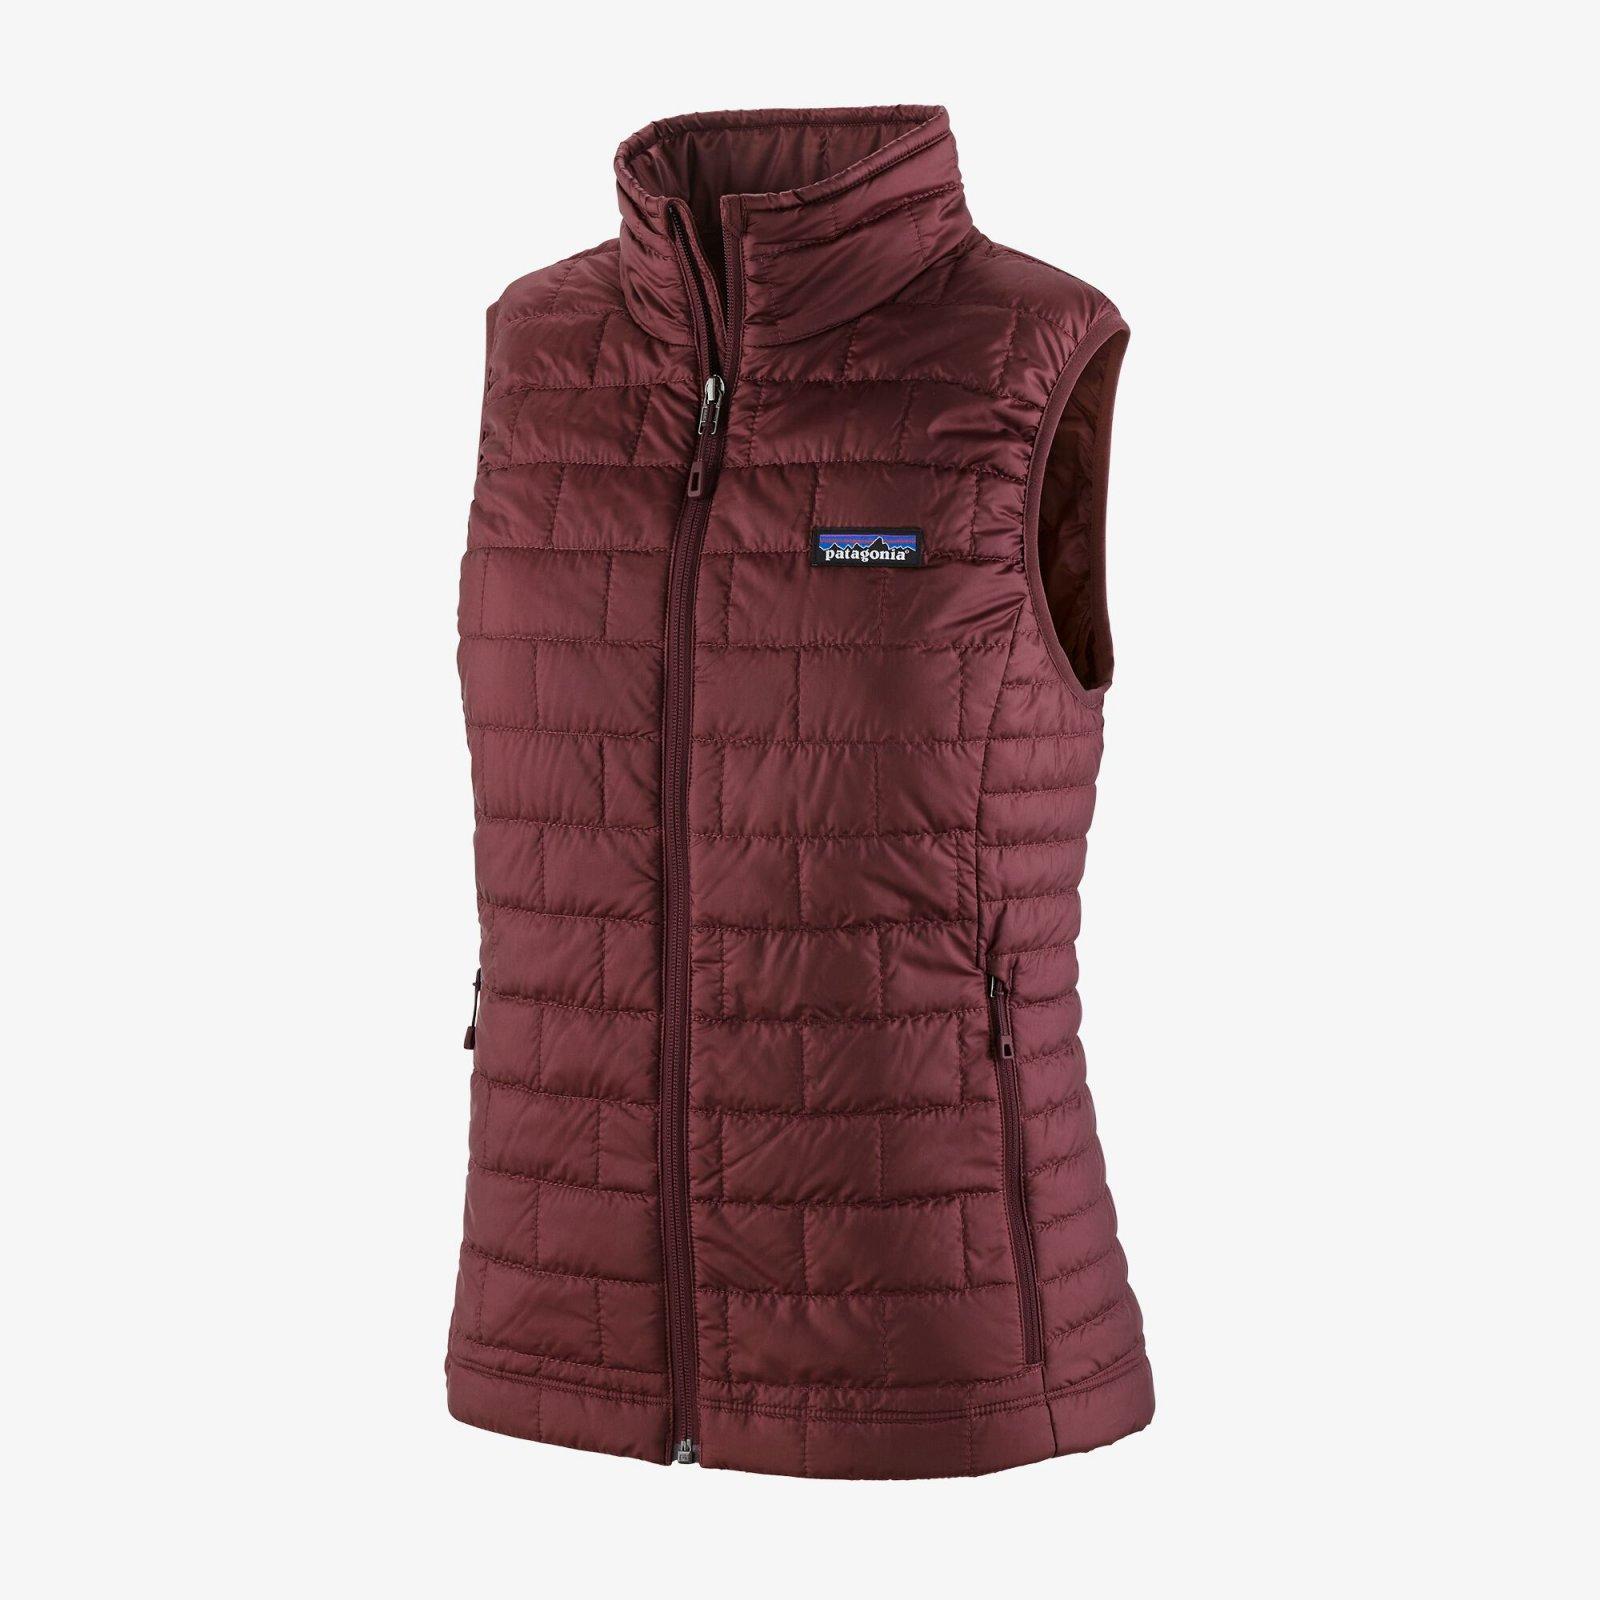 W's Patagonia Nano Puff Vest in Dark Ruby